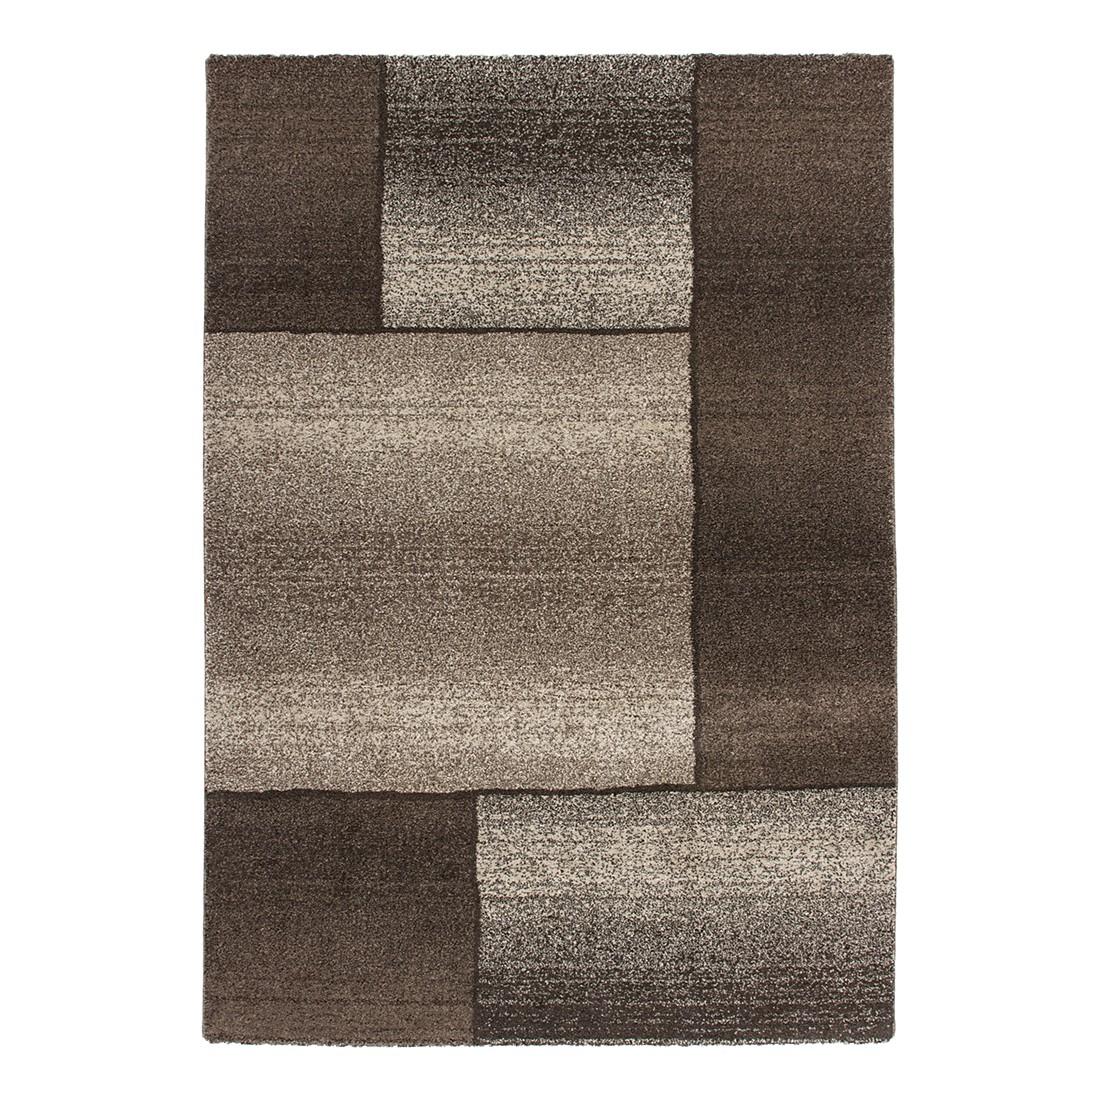 Teppich Kenya – Nakuru – Beige – 80 x 150 cm, Kayoom online bestellen